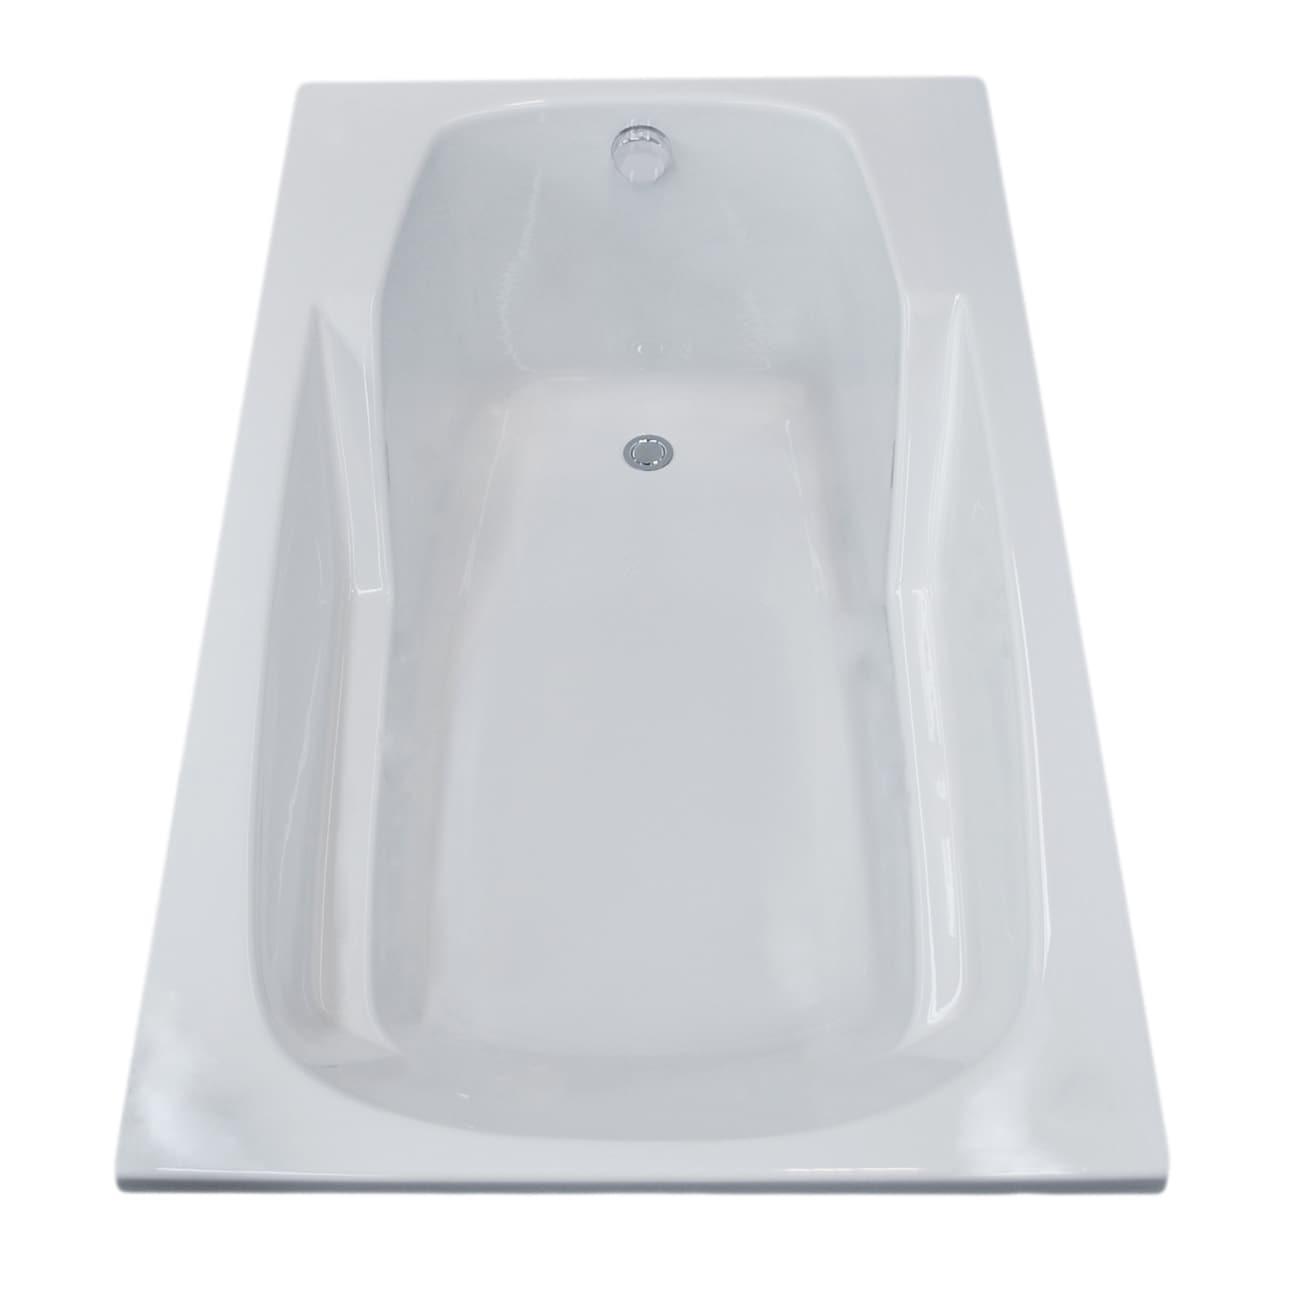 Atlantis Whirlpools Eros 36 x 60 Rectangular Soaking Bathtub in ...